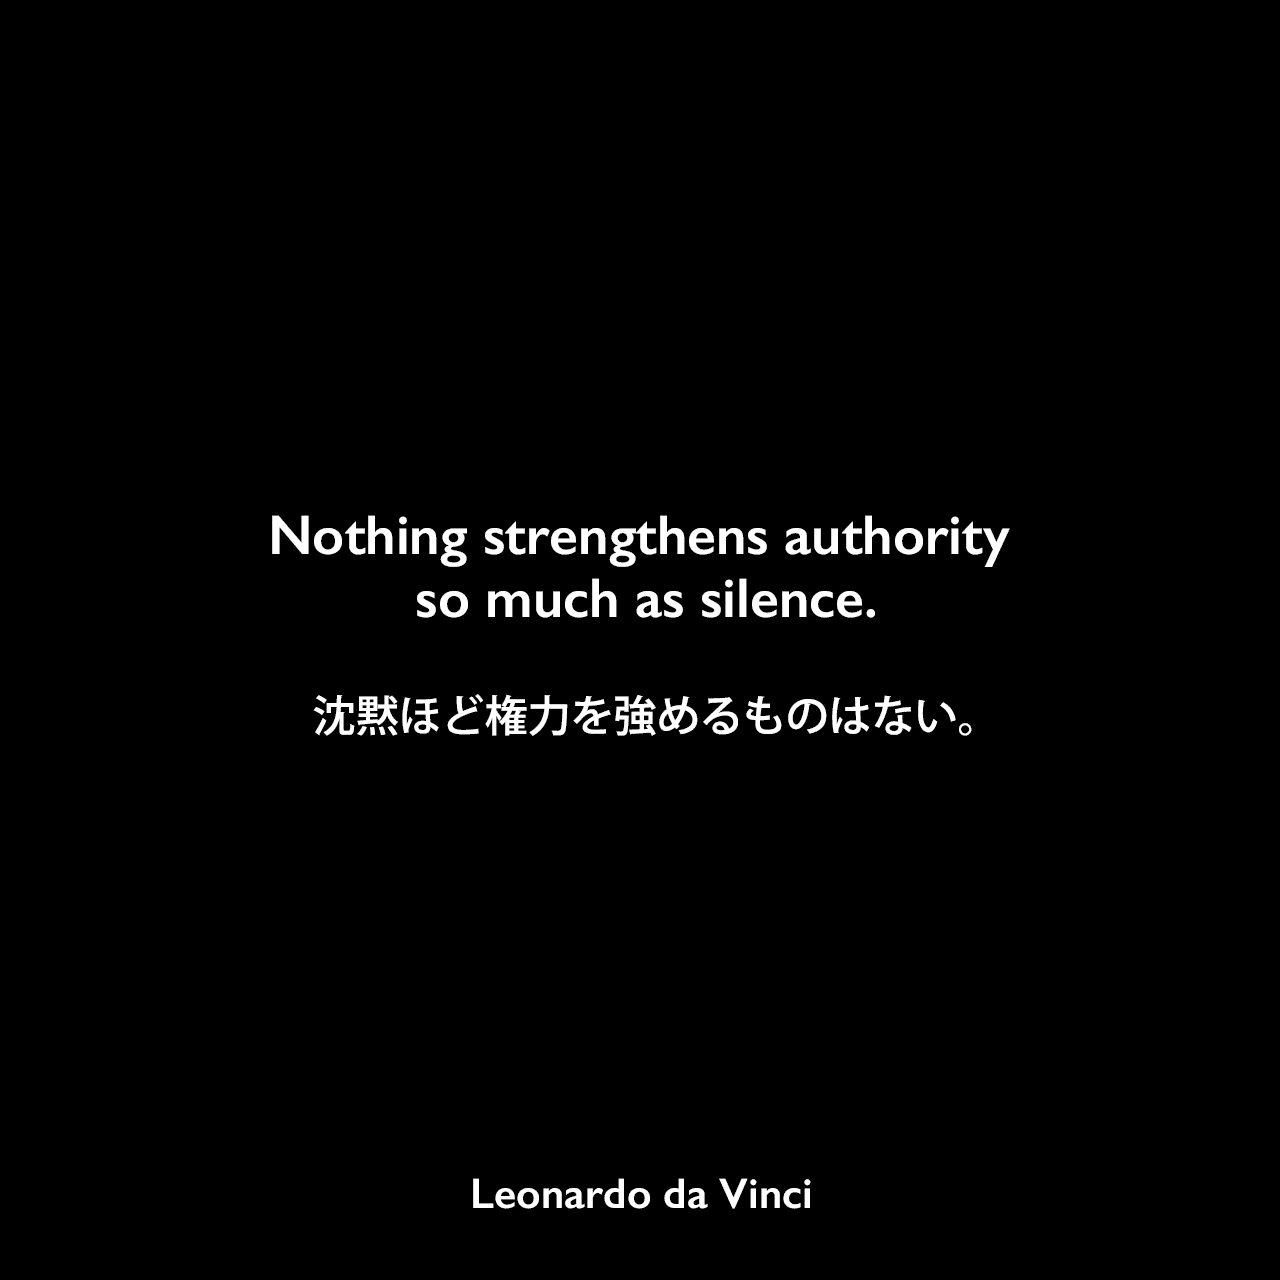 Nothing strengthens authority so much as silence.沈黙ほど権力を強めるものはない。Leonardo da Vinci